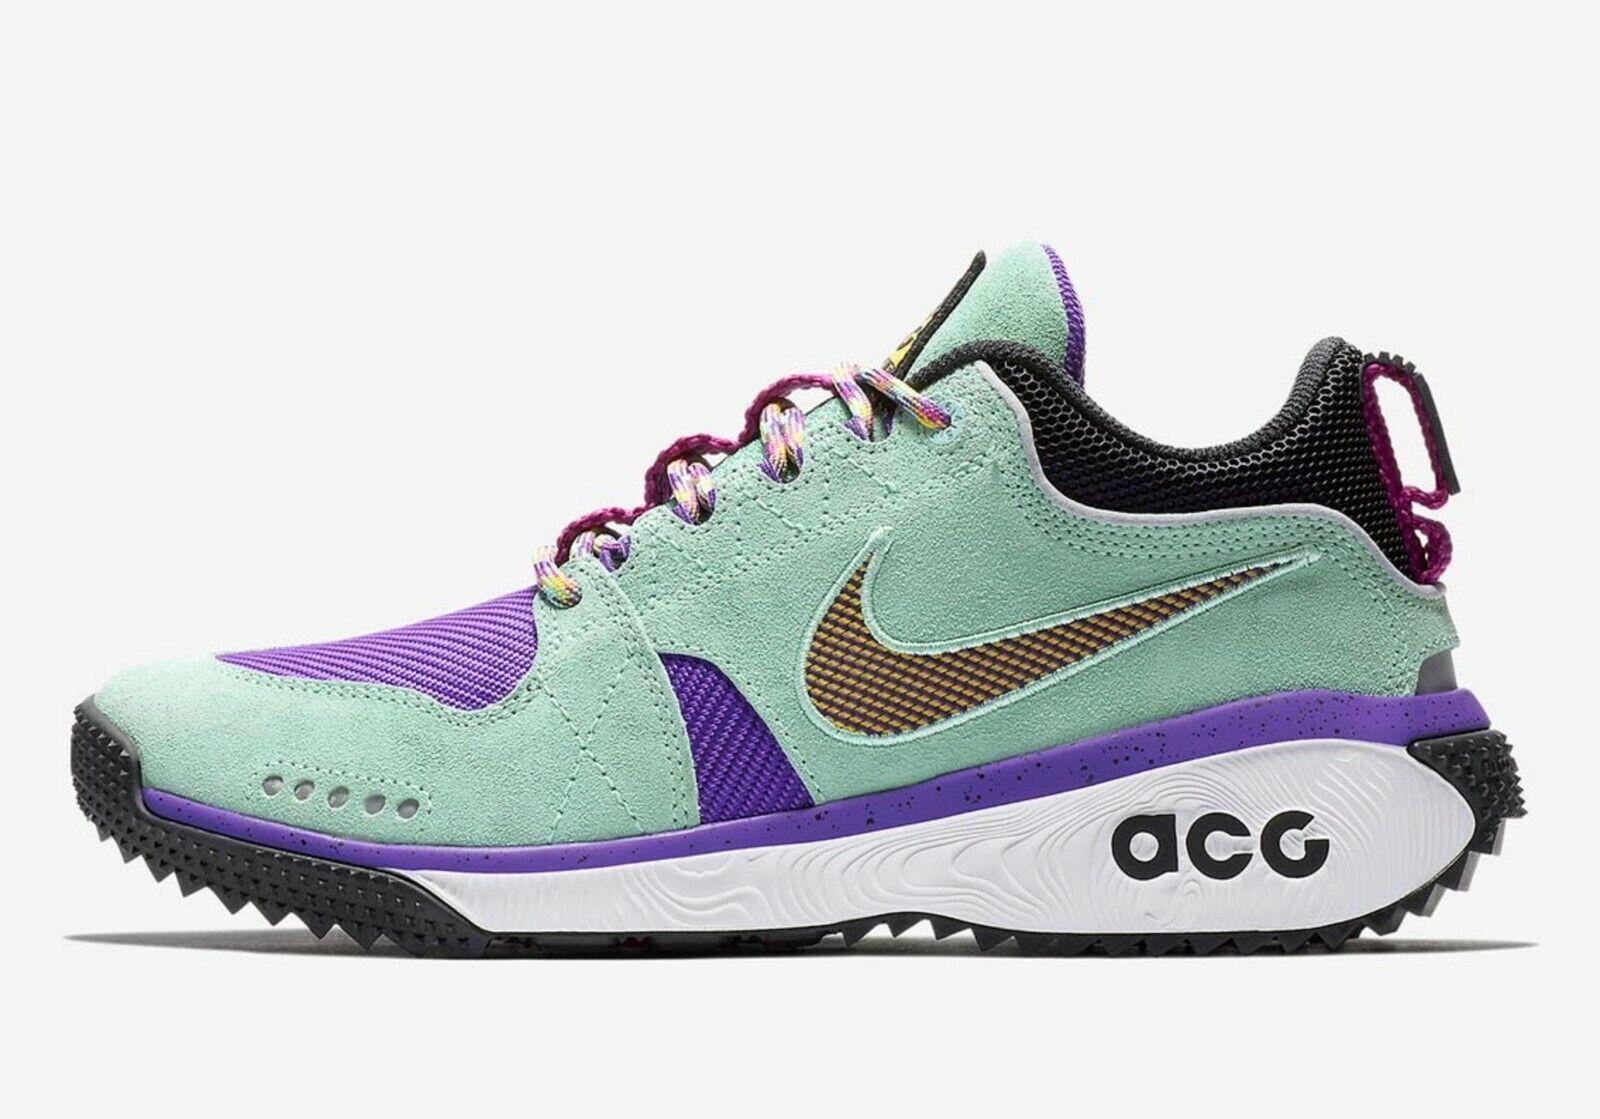 Nike ACG Dog Mountain Mens Size 10 WMNS WMNS WMNS Size 11.5 Hiking shoes AQ0916 300 GA 566 f63c48